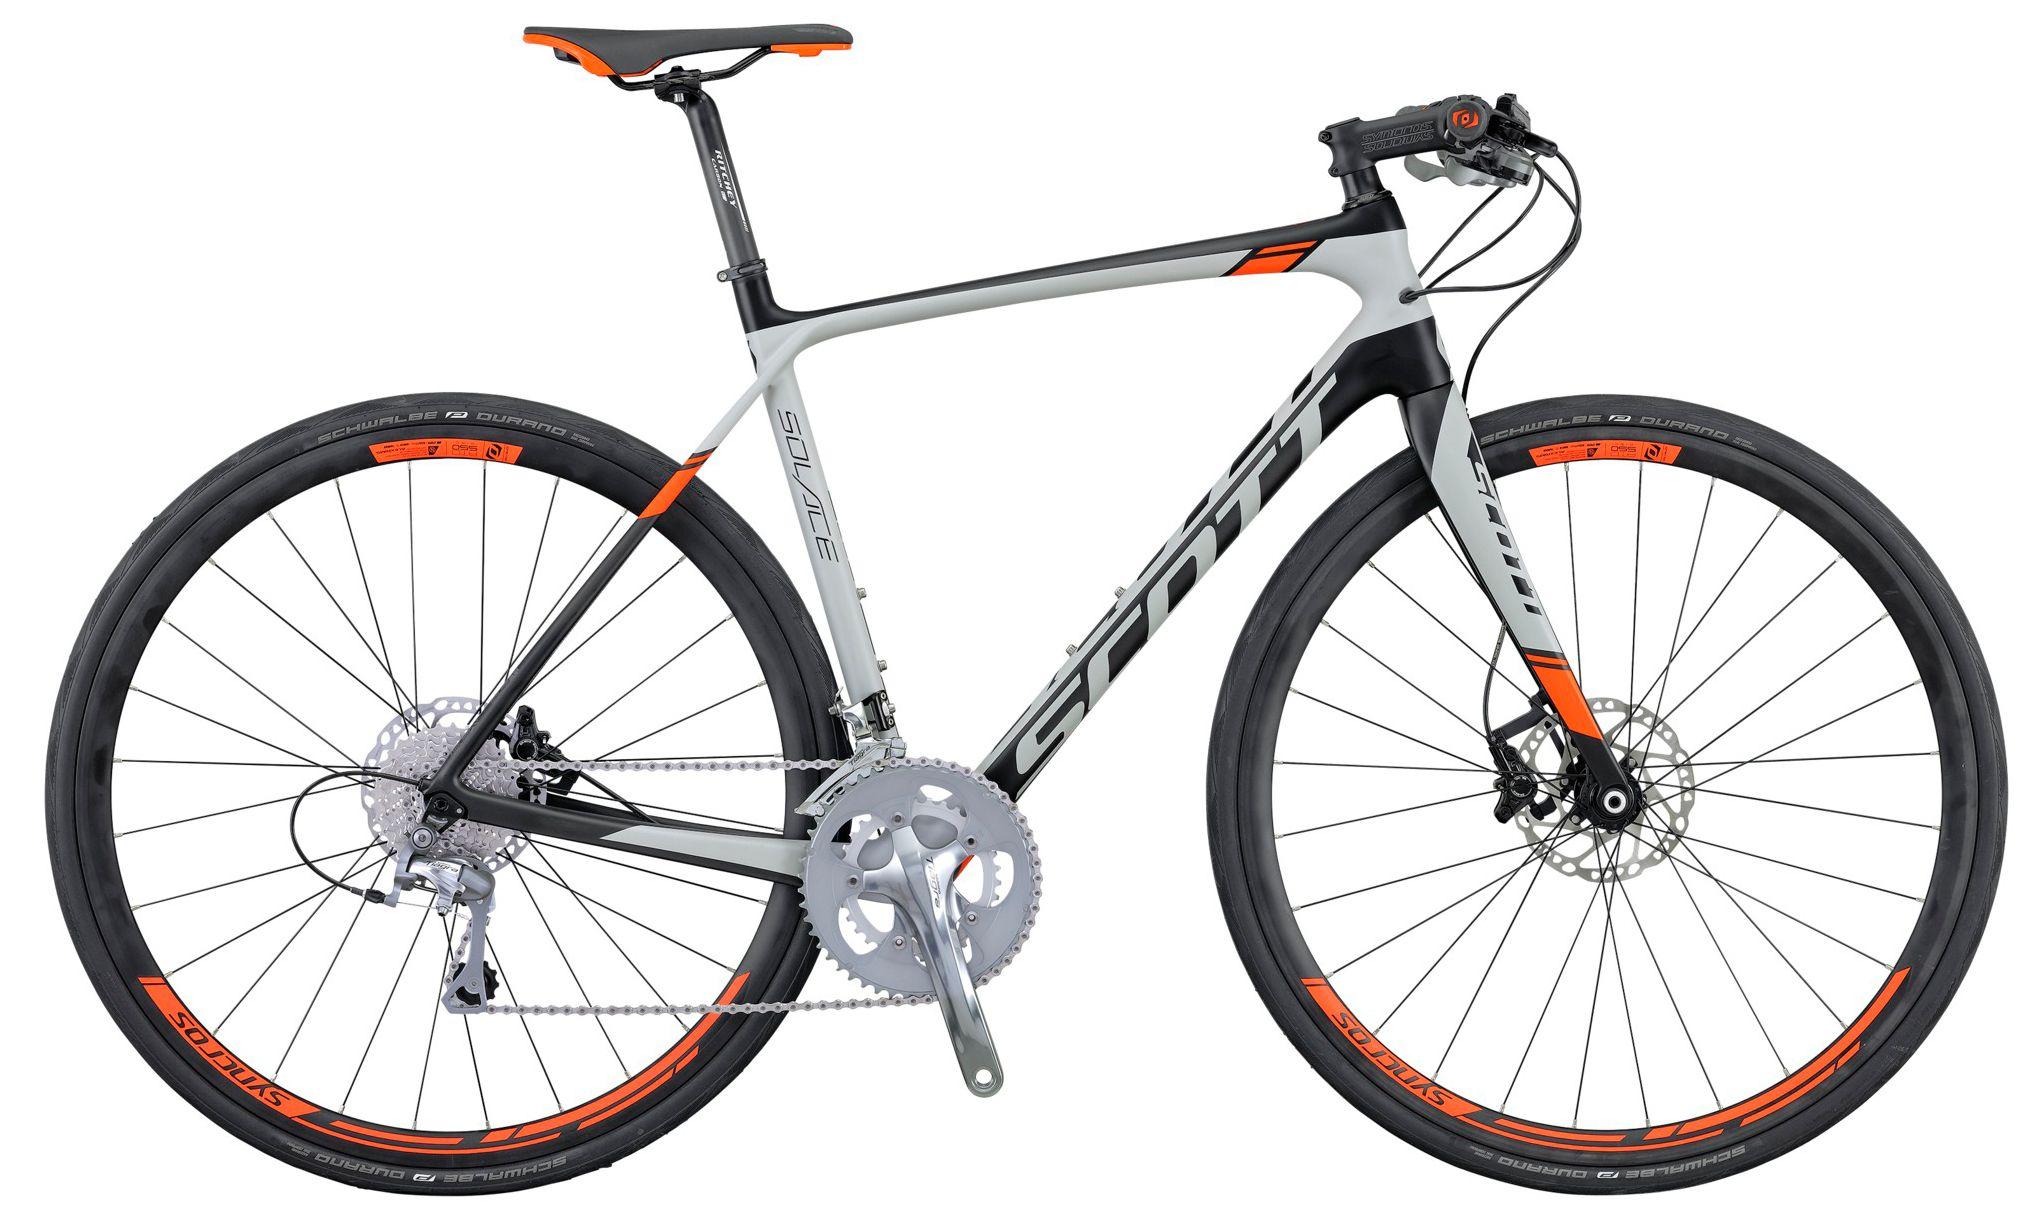 Велосипед Scott Solace 30 FB disc 2016 велосипед scott solace 40 fb disc 2015